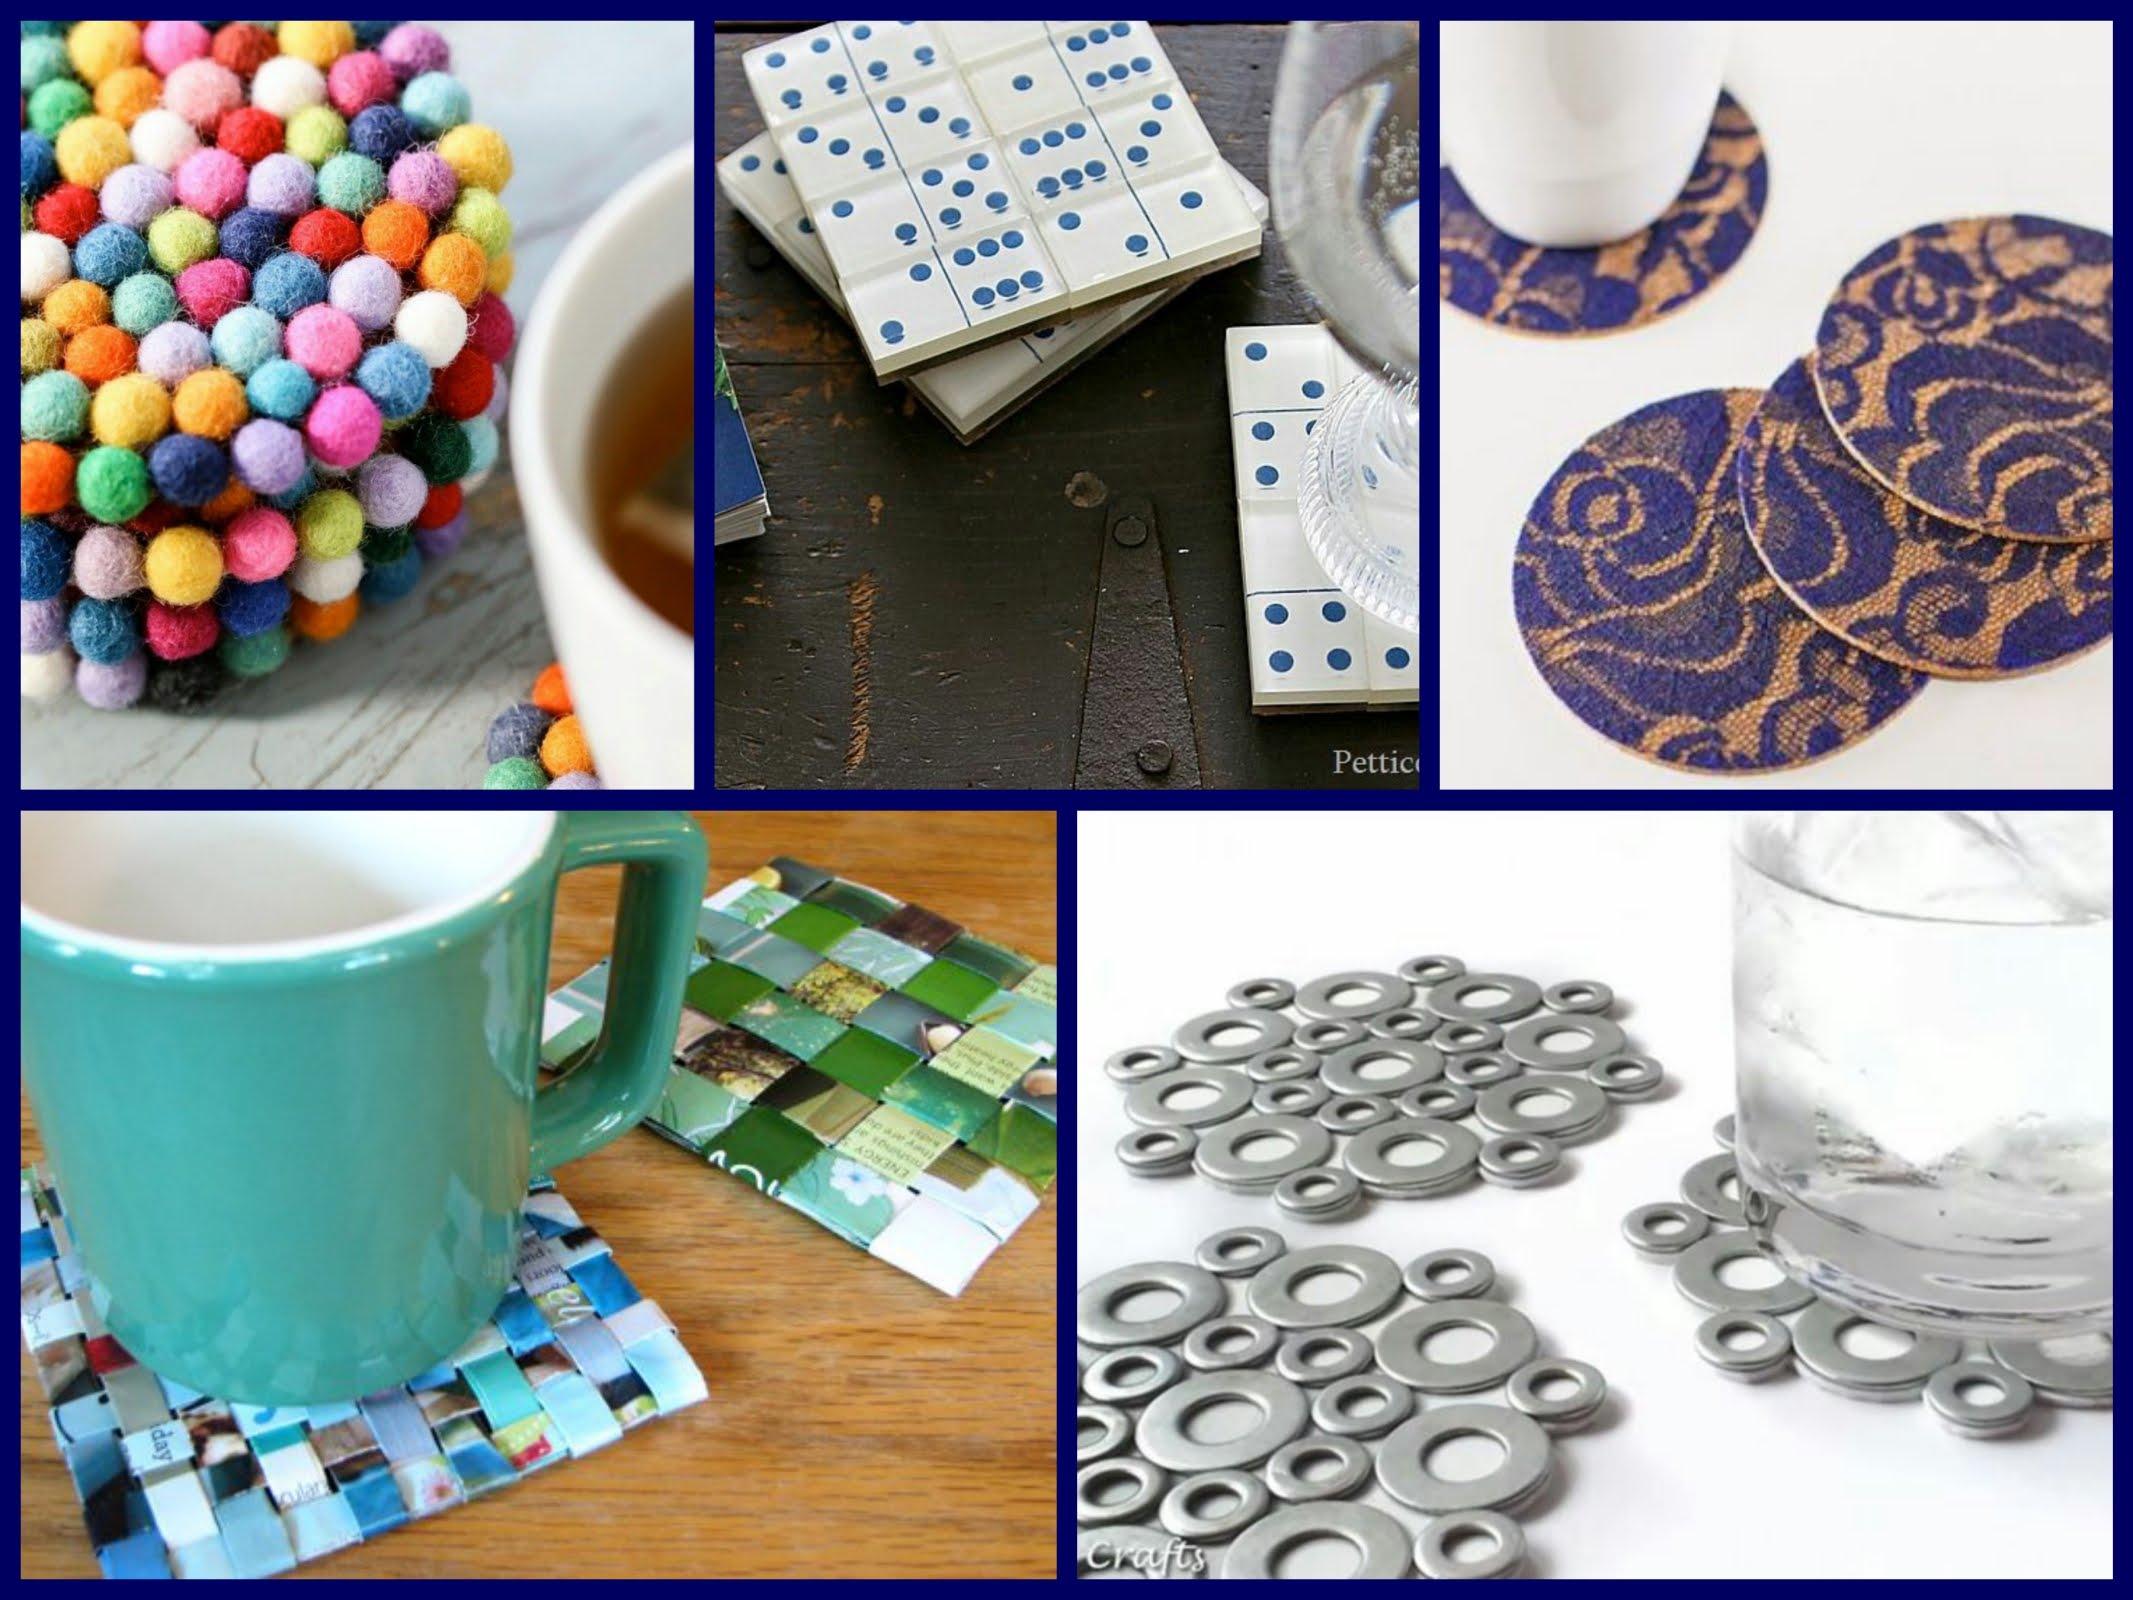 30+ DIY Coasters Decorating Ideas - Handmade Home Decor - YouTube